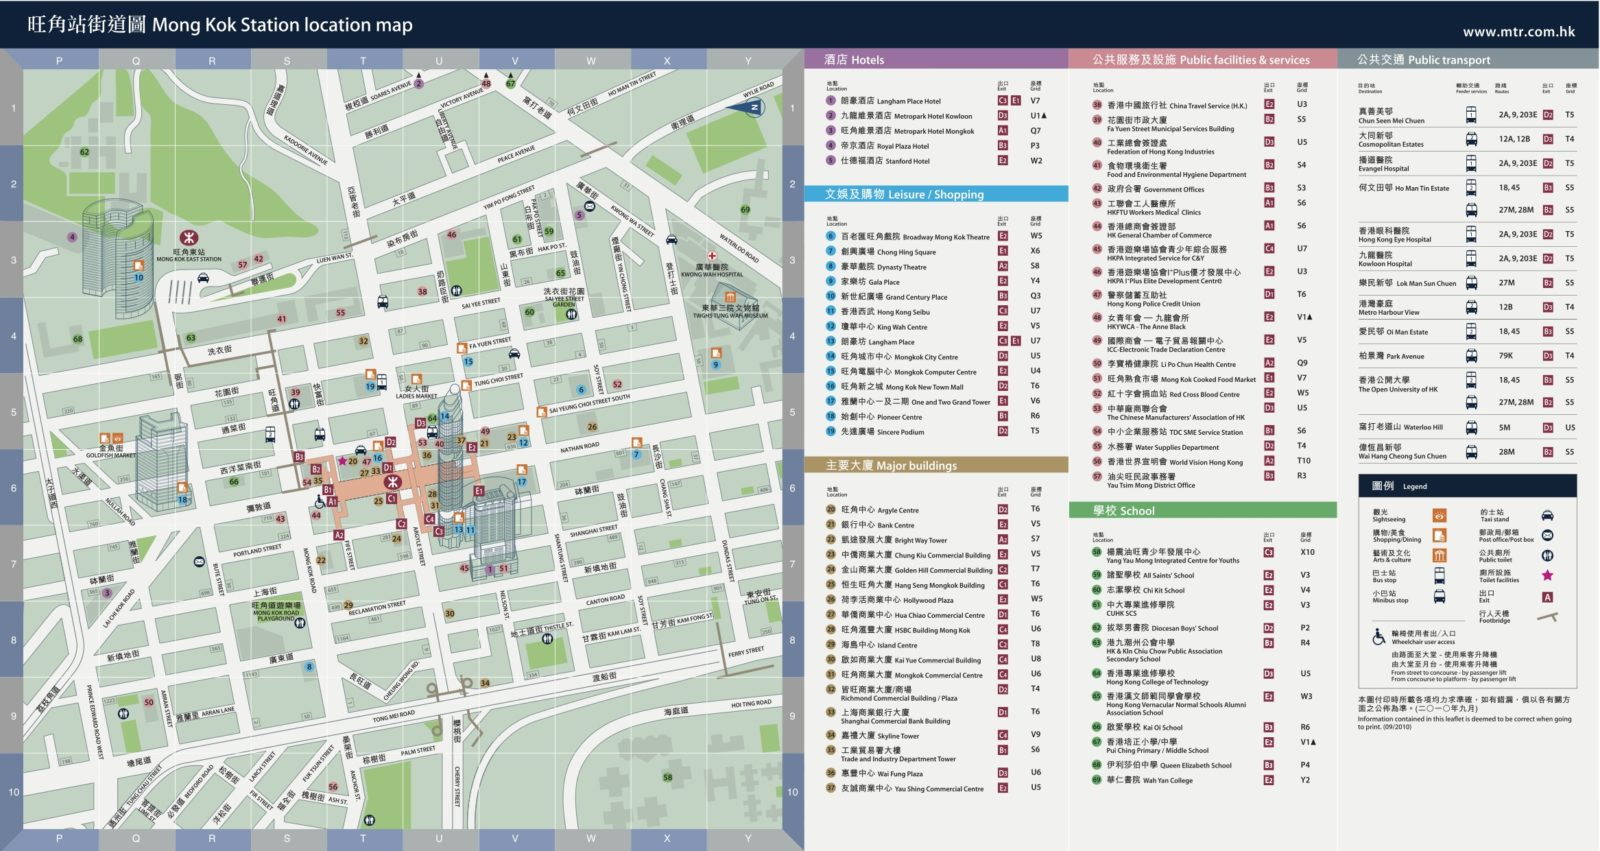 Kowloon: Mong Kok MTR station area map 2012-2013